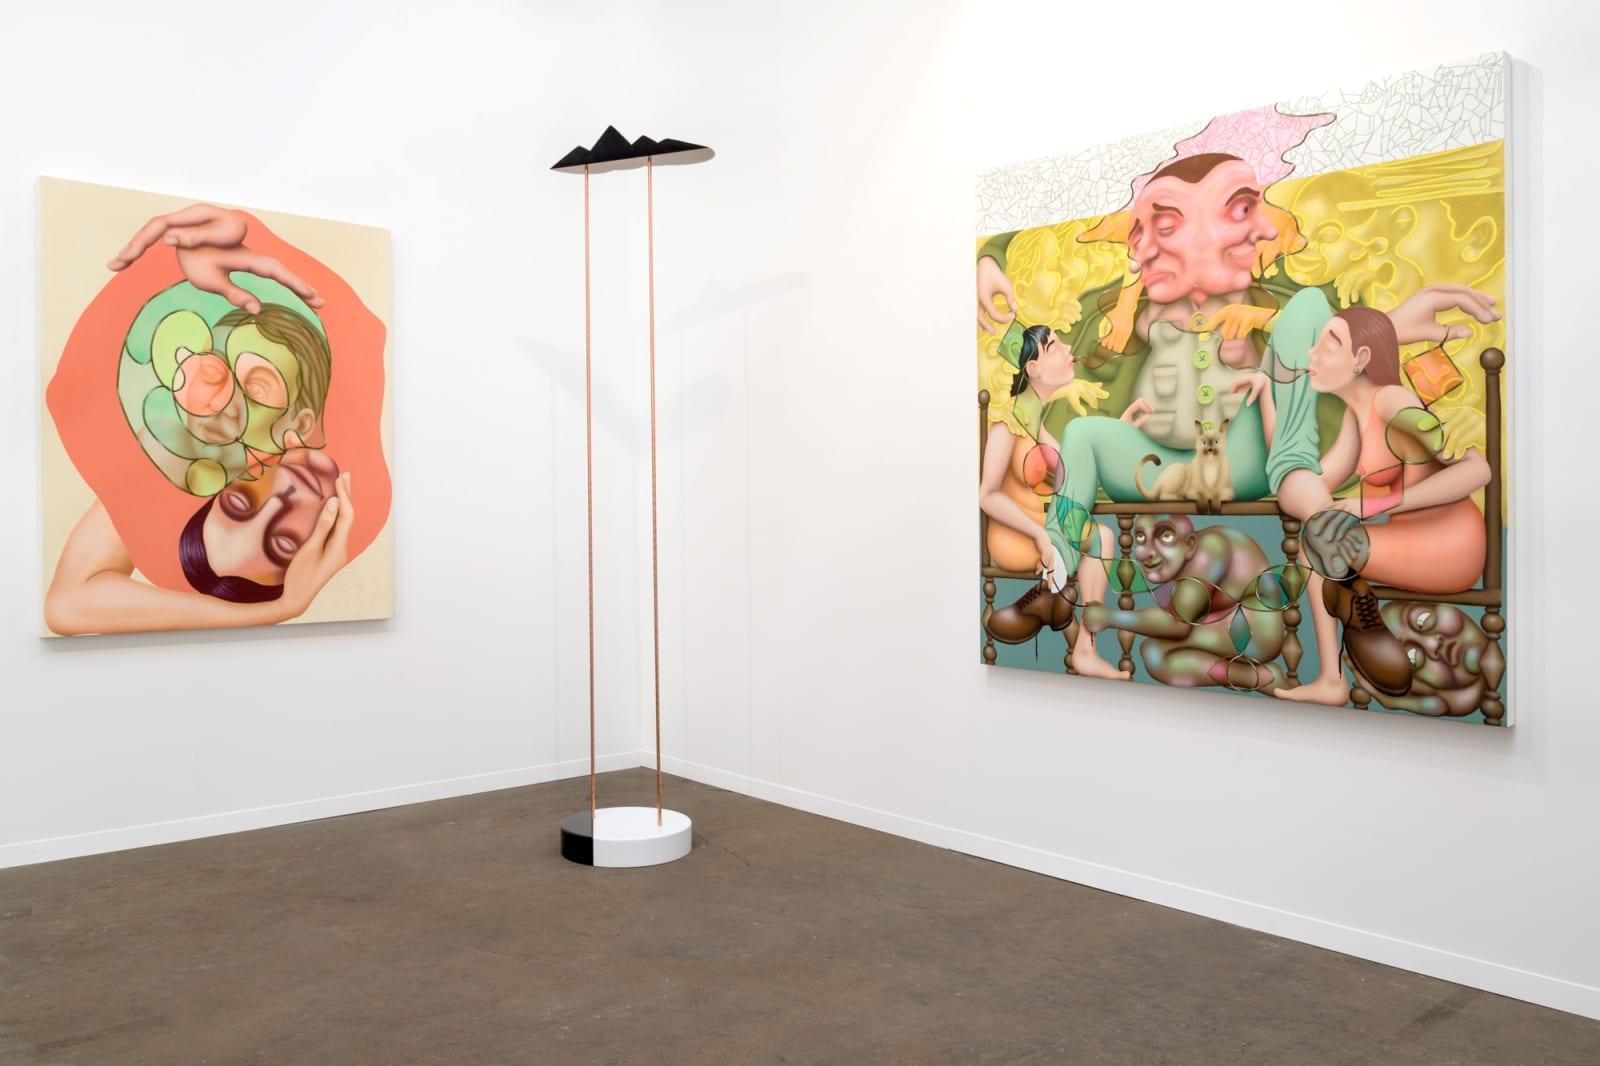 Installation view, Shulamit Nazarian at Art Brussels 2017